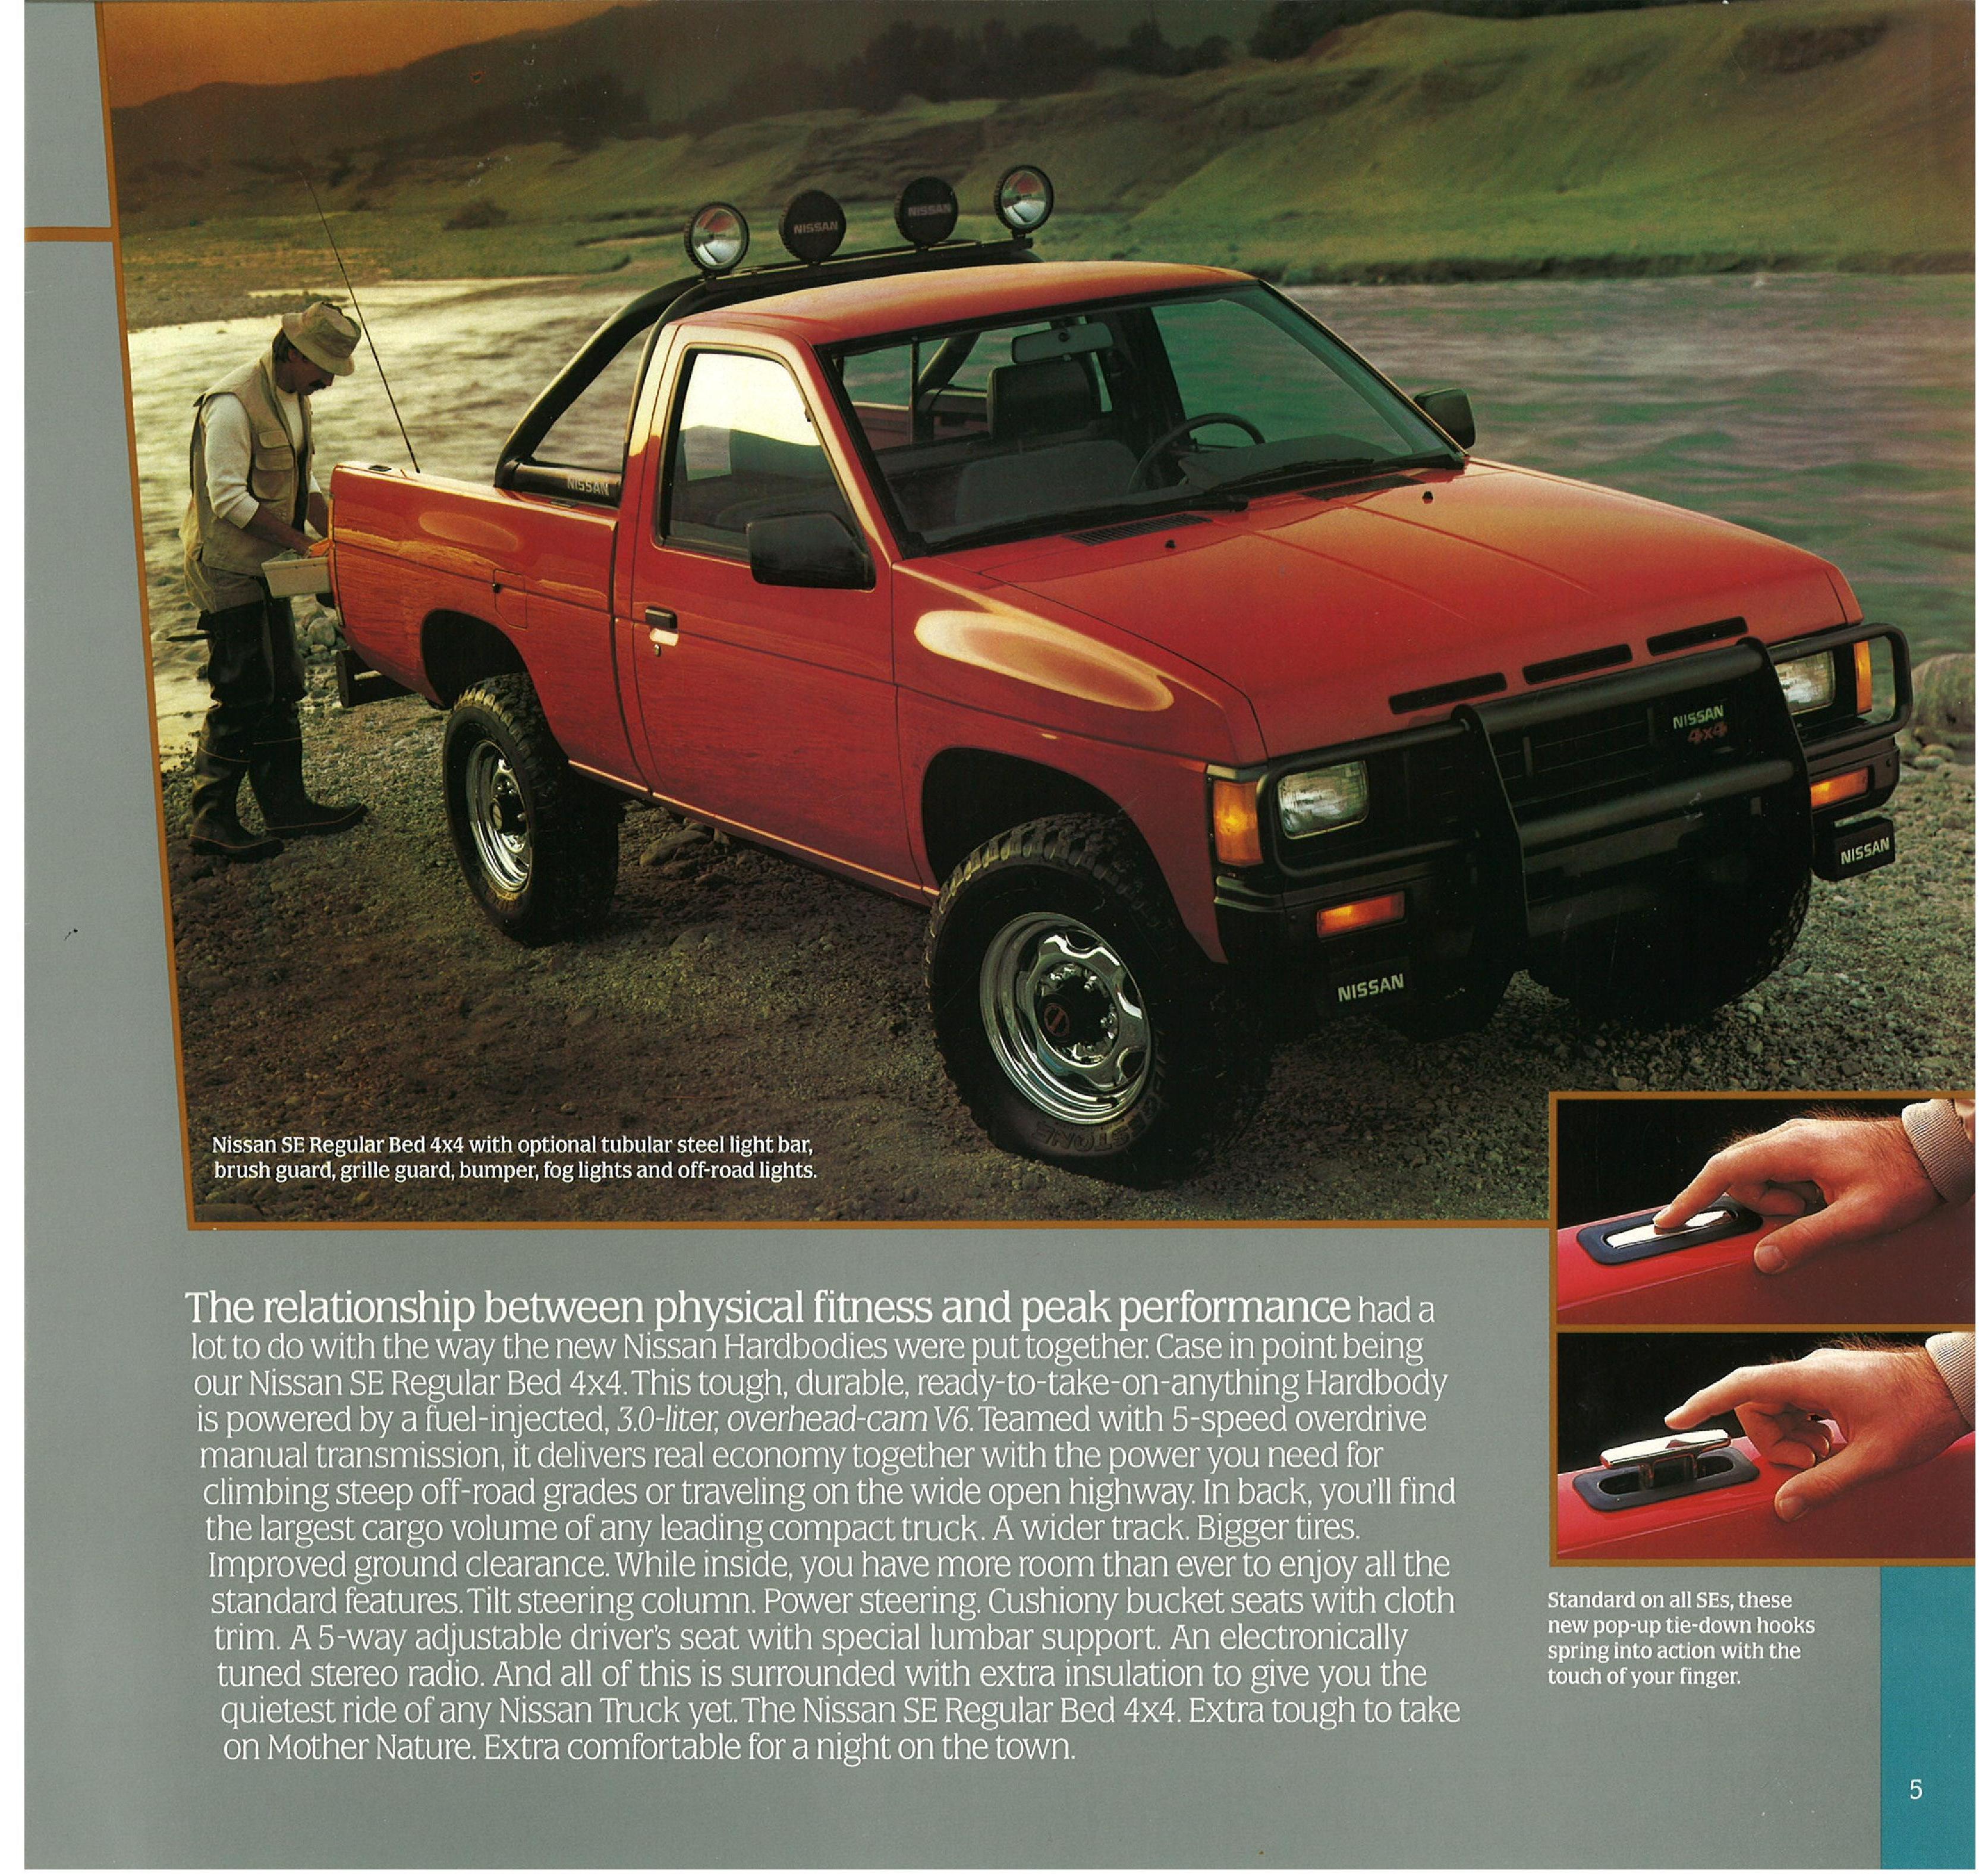 1987 nissan truck d21 dealer brochure us market